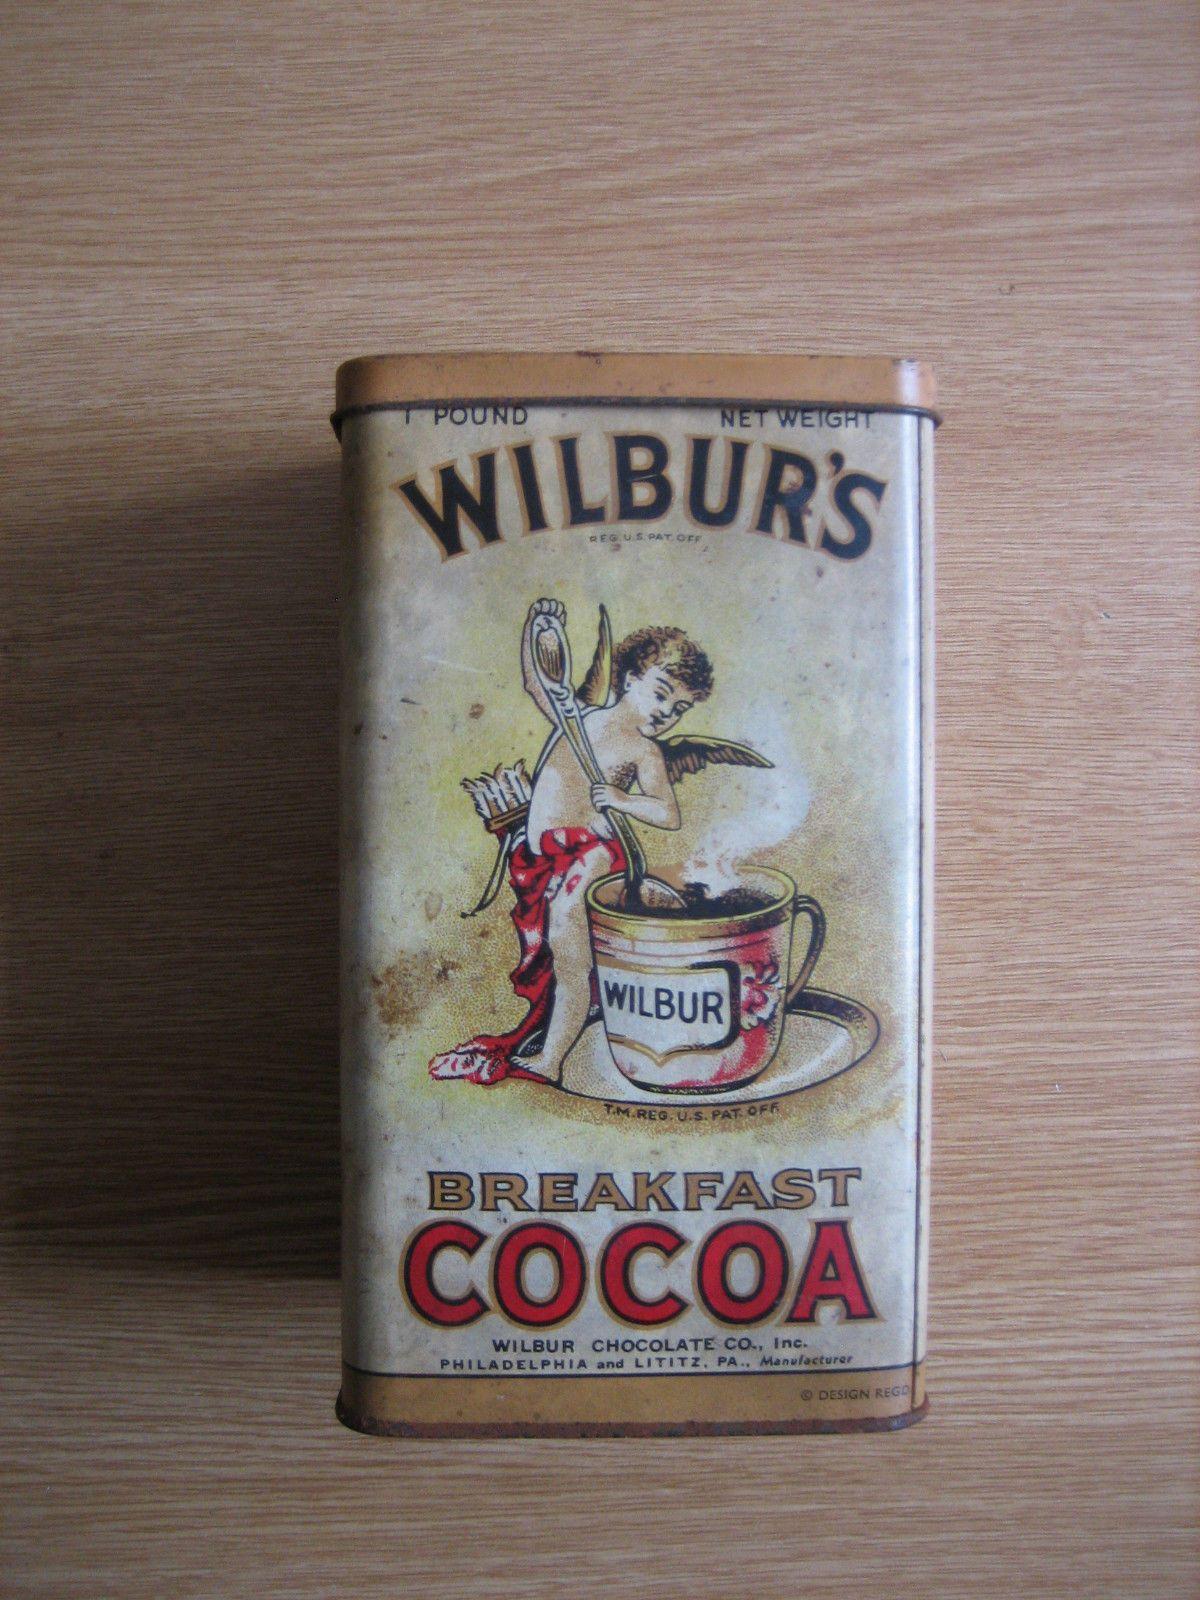 Wilbur's Breakfast Cocoa Tin - Retro / Vintage - 1 lb - Long Island